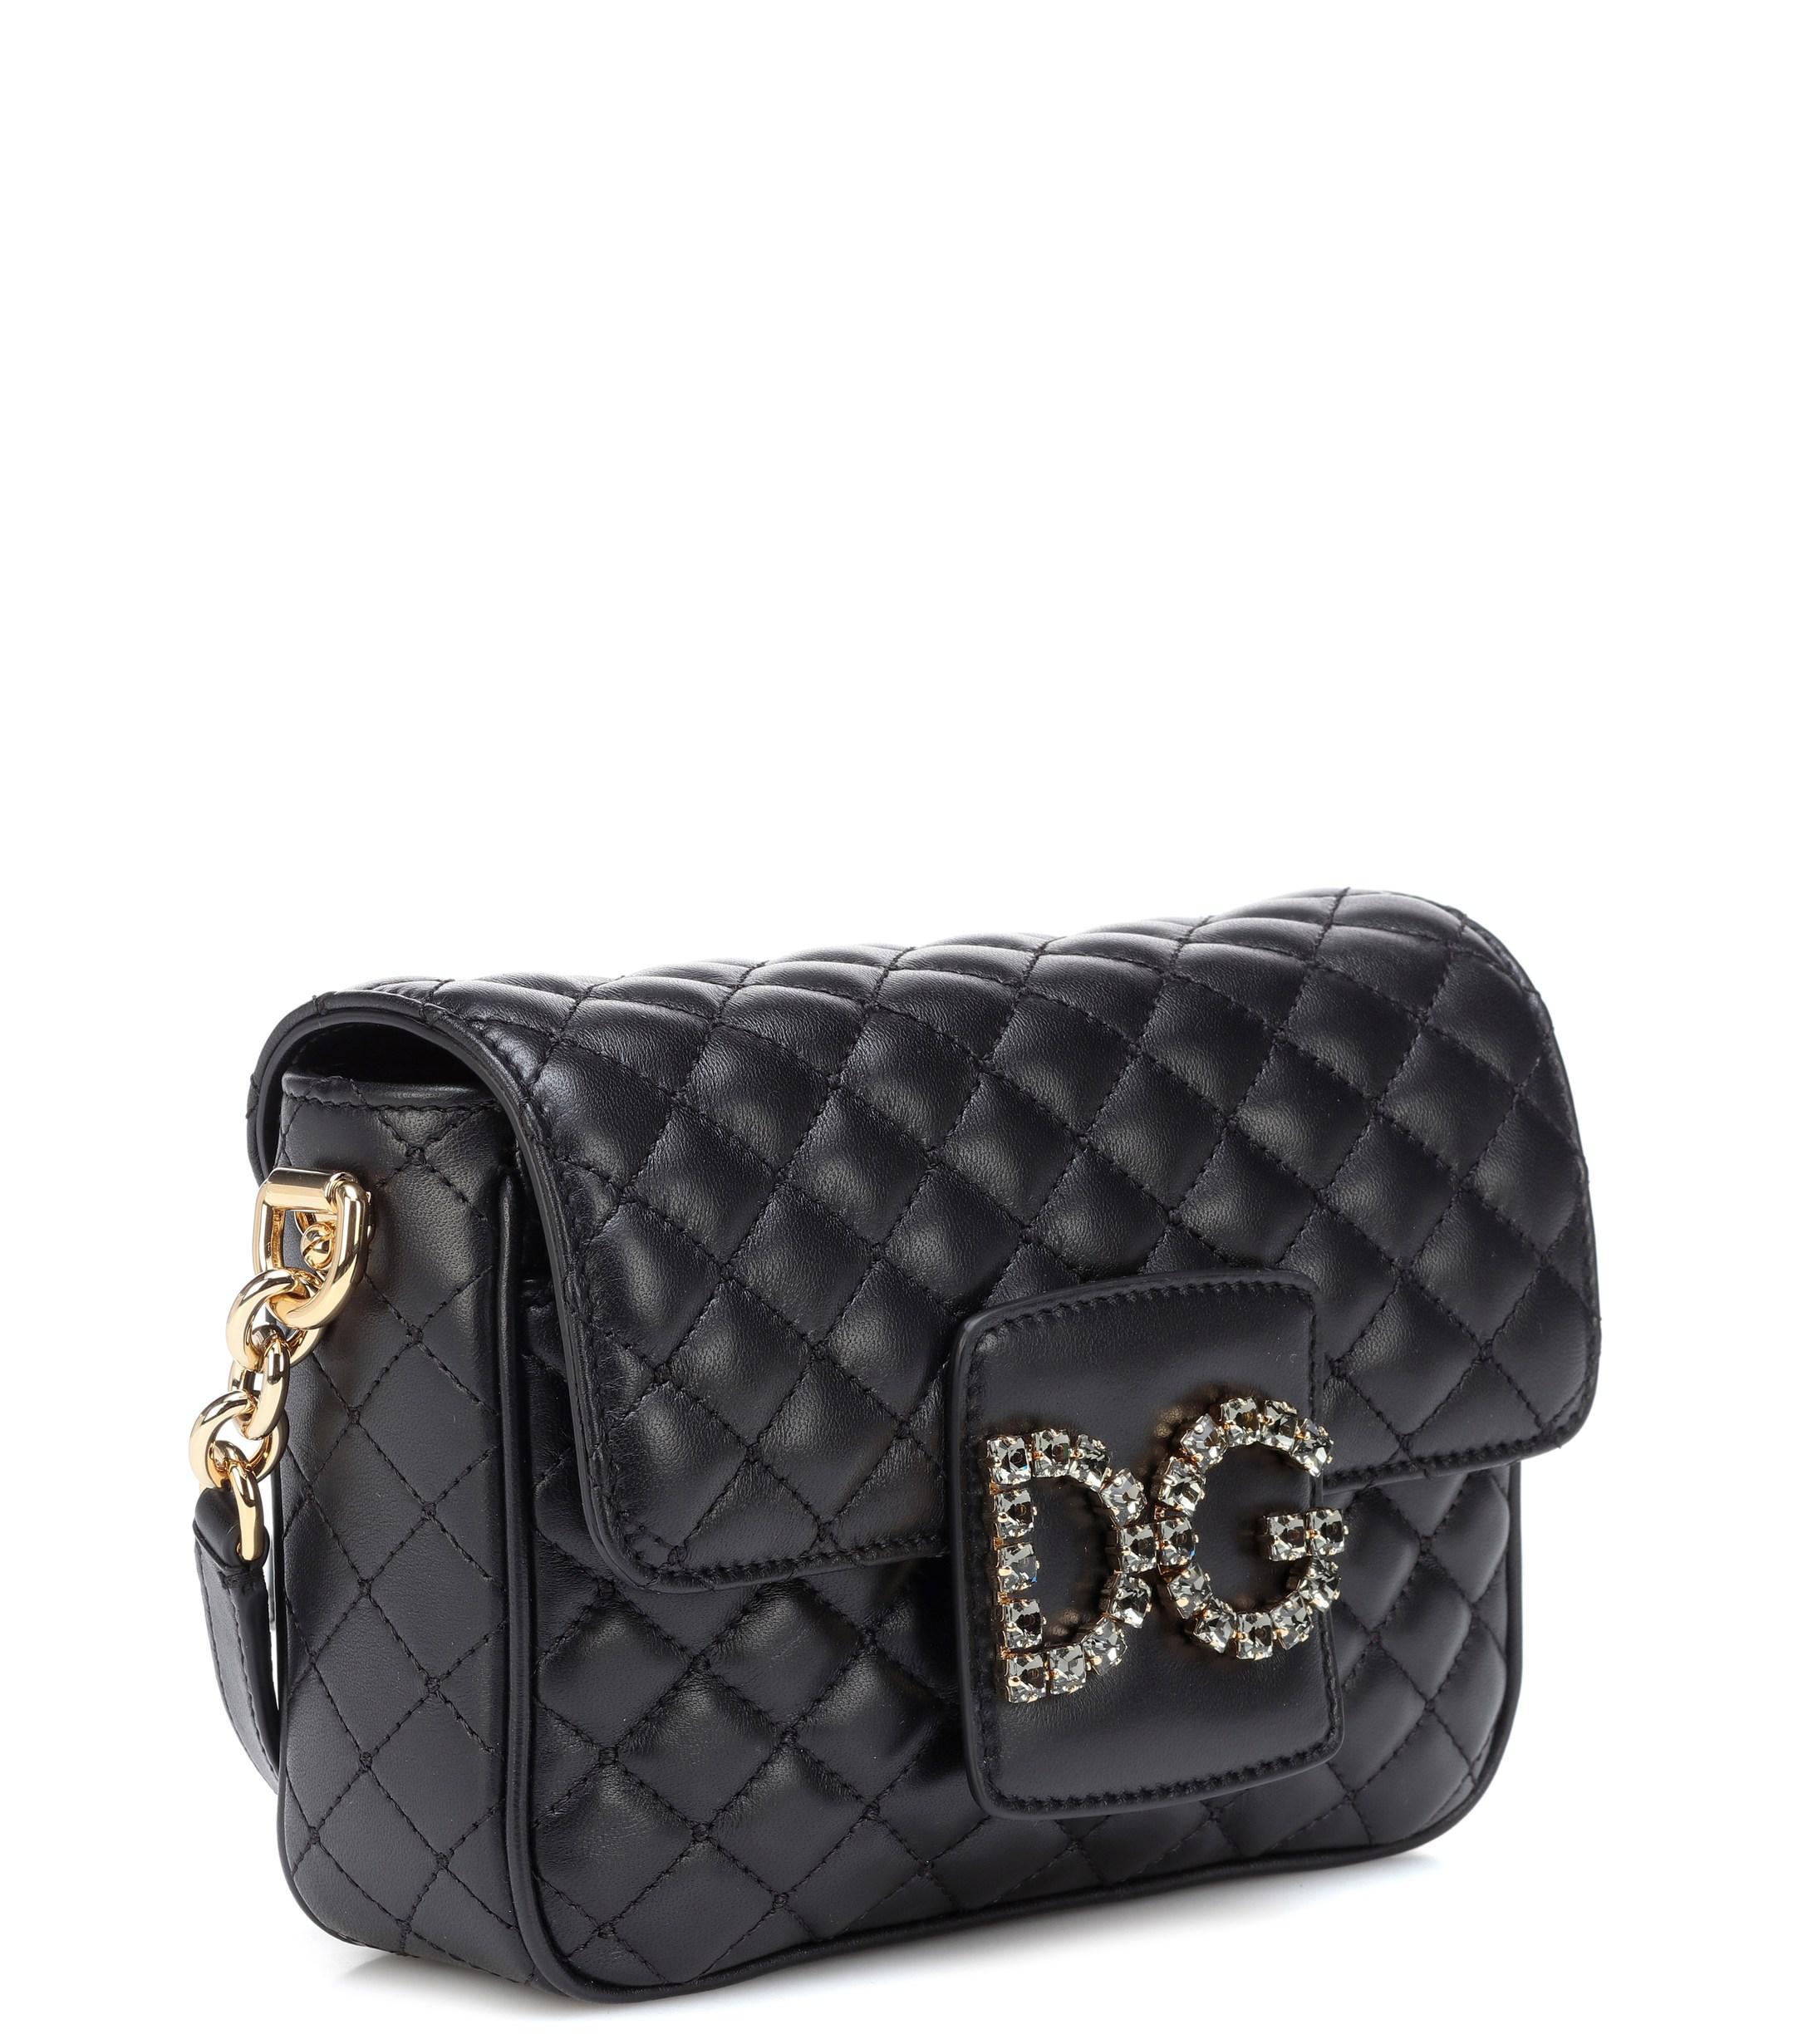 Dolce   Gabbana - Black Dg Millennials Small Shoulder Bag - Lyst. View  fullscreen d2e129761392c